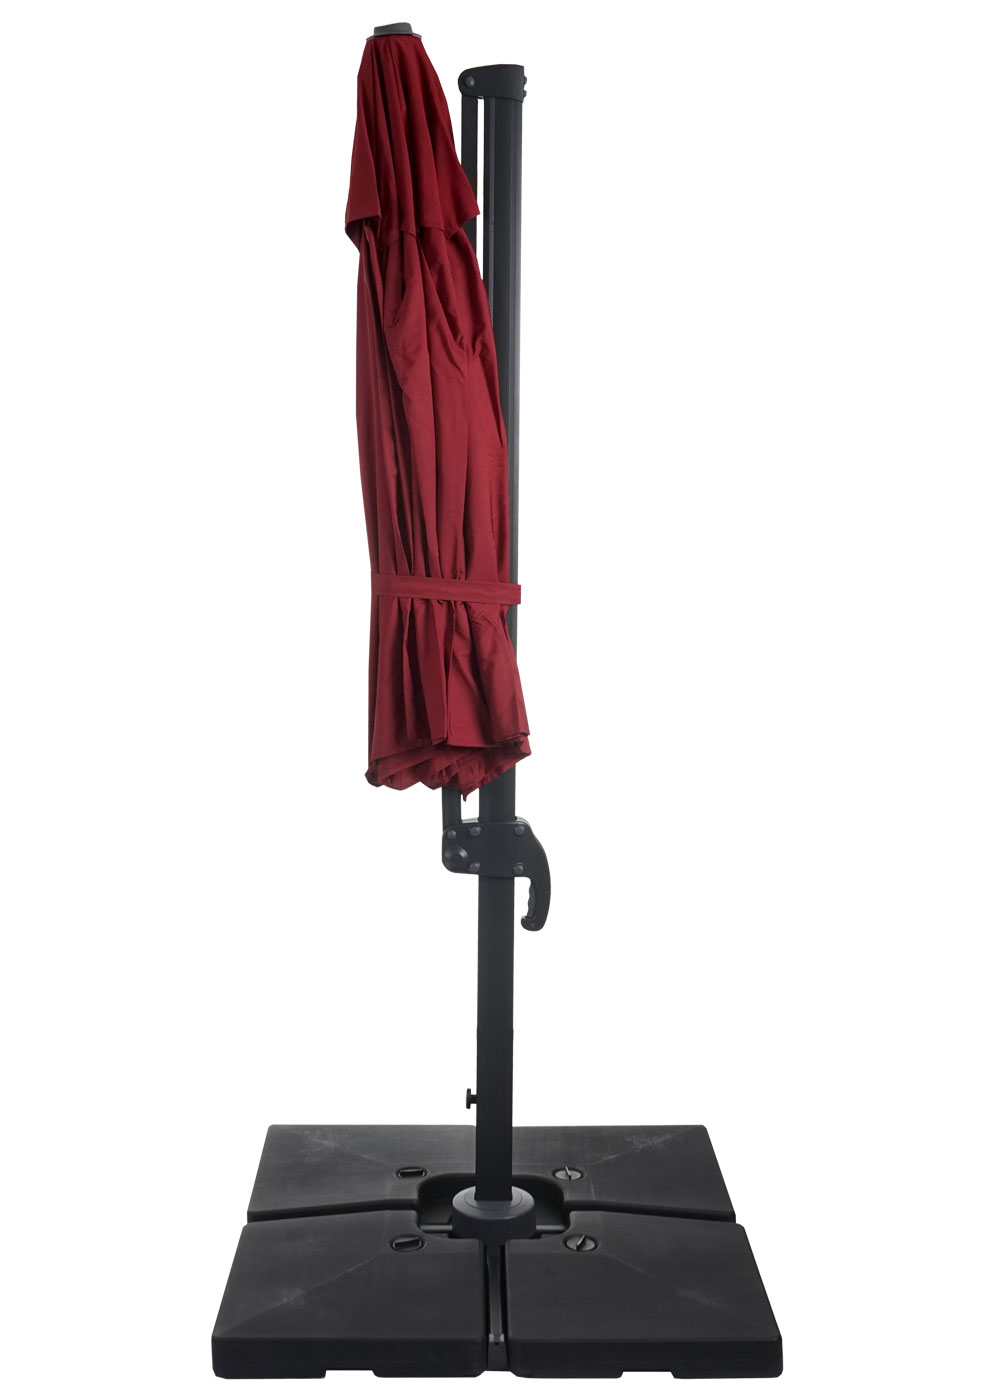 gastronomie luxus ampelschirm sonnenschirm n22 3 5m. Black Bedroom Furniture Sets. Home Design Ideas